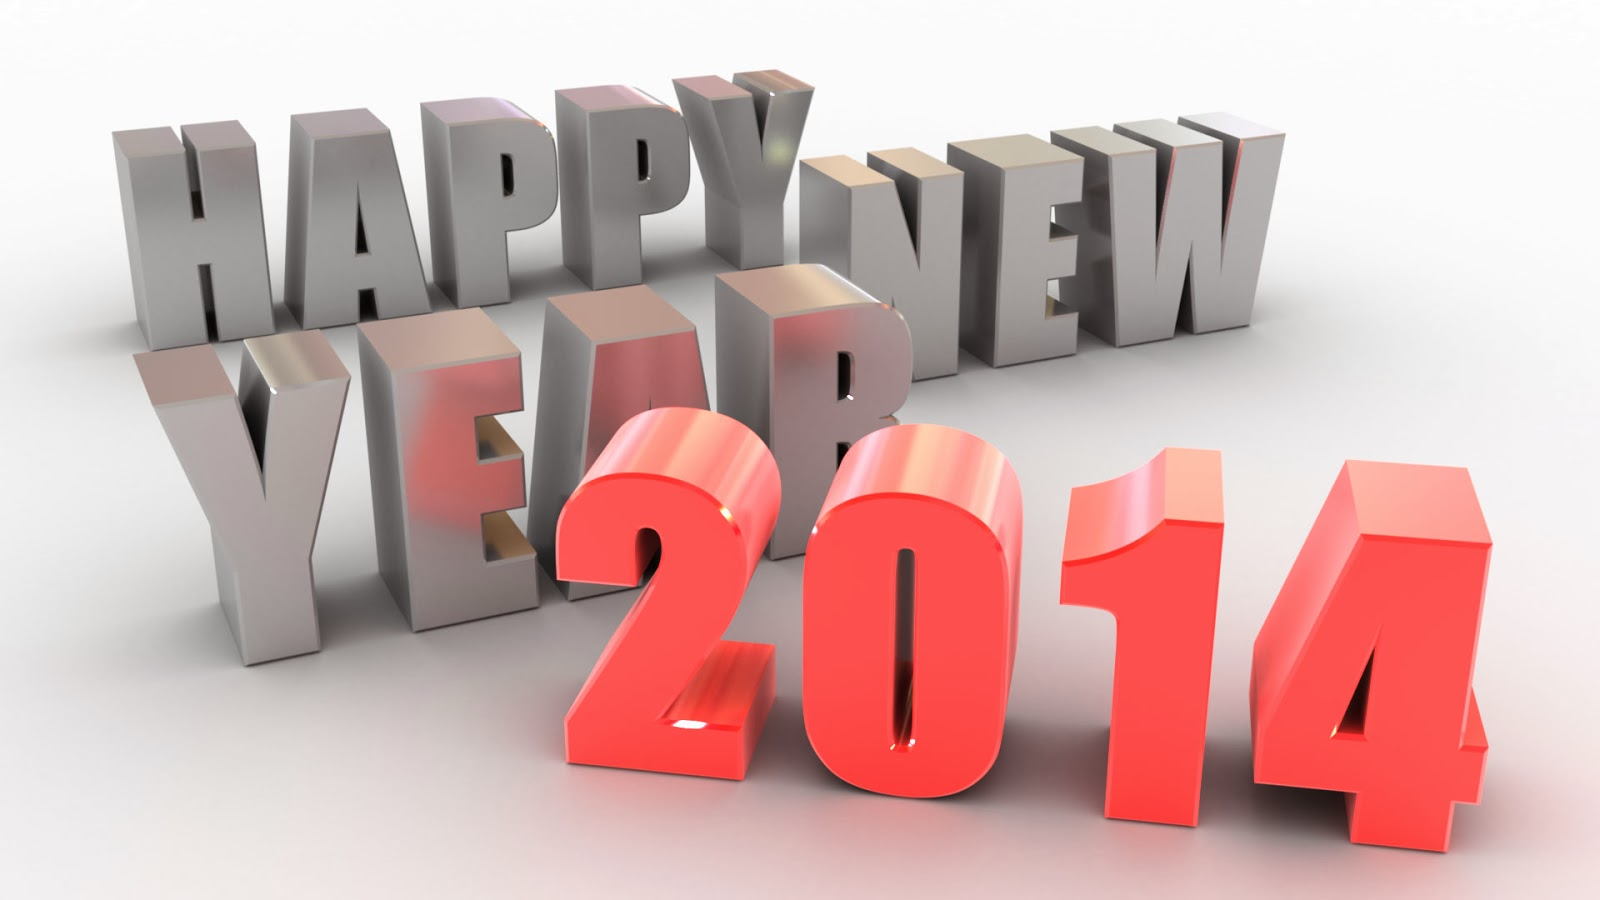 Happy-New-Year-2014-Happy-New-Year-2014-SMs-2014-New-Year-Pictures-New-Year-Cards-New-Year-Wallpapers-New-Year-Greetings-Blak-Red-Blu-Sky-cCards-Download-Free-98